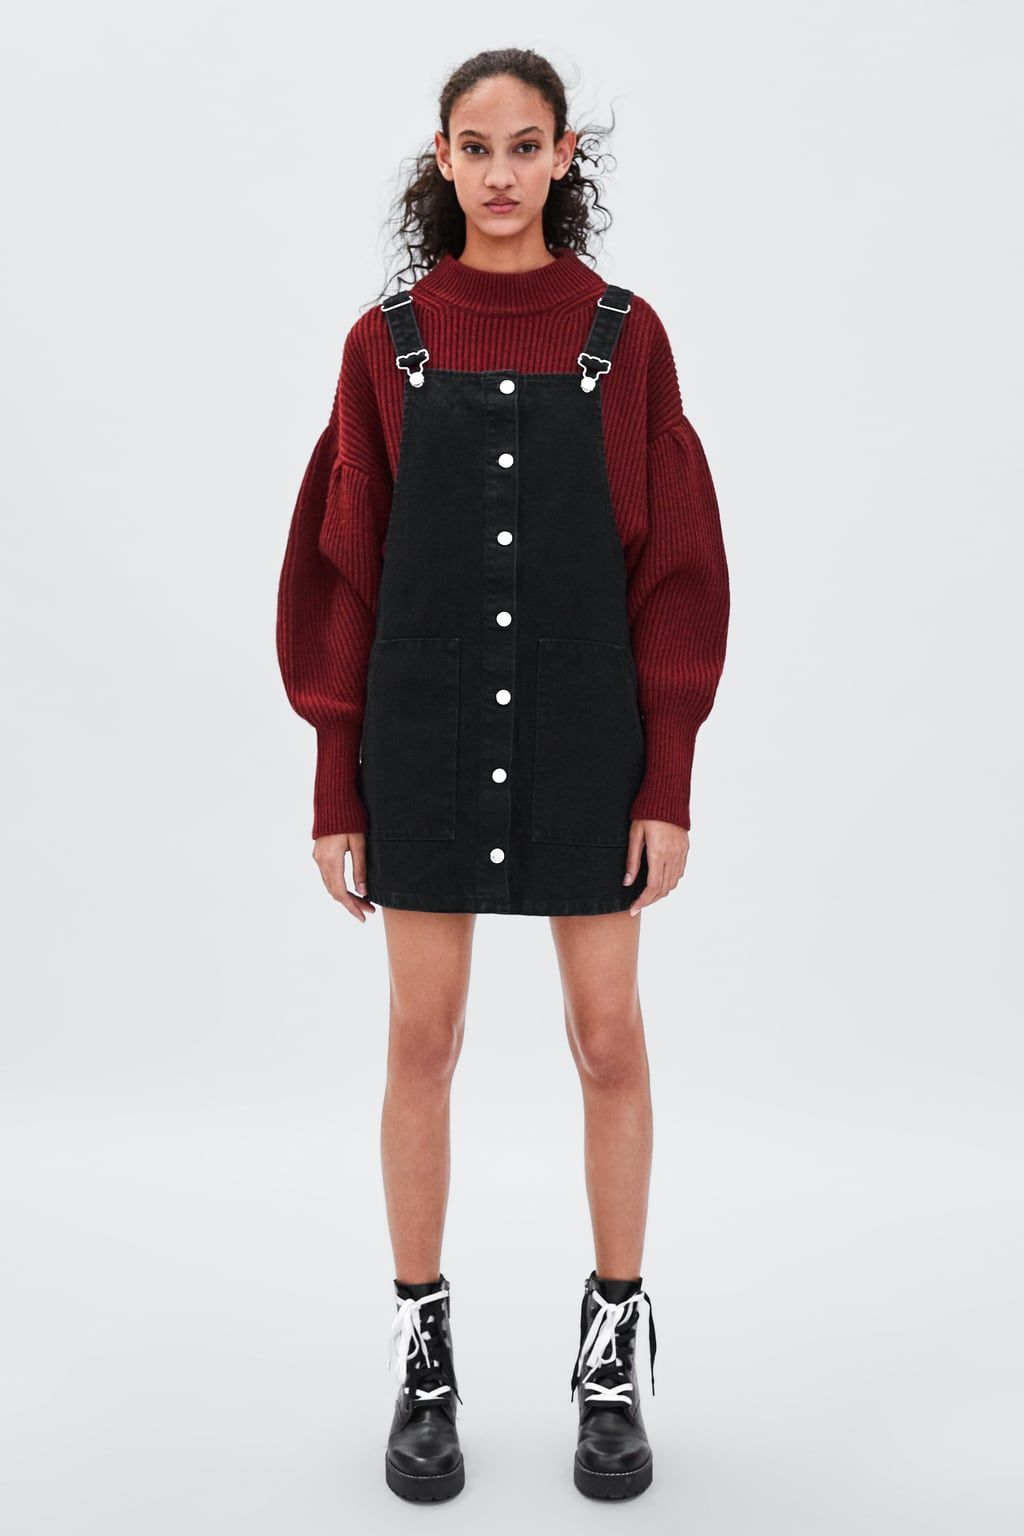 b3717f5982 Authentic denim pinafore dress in 2019 | Create. | Denim pinafore ...